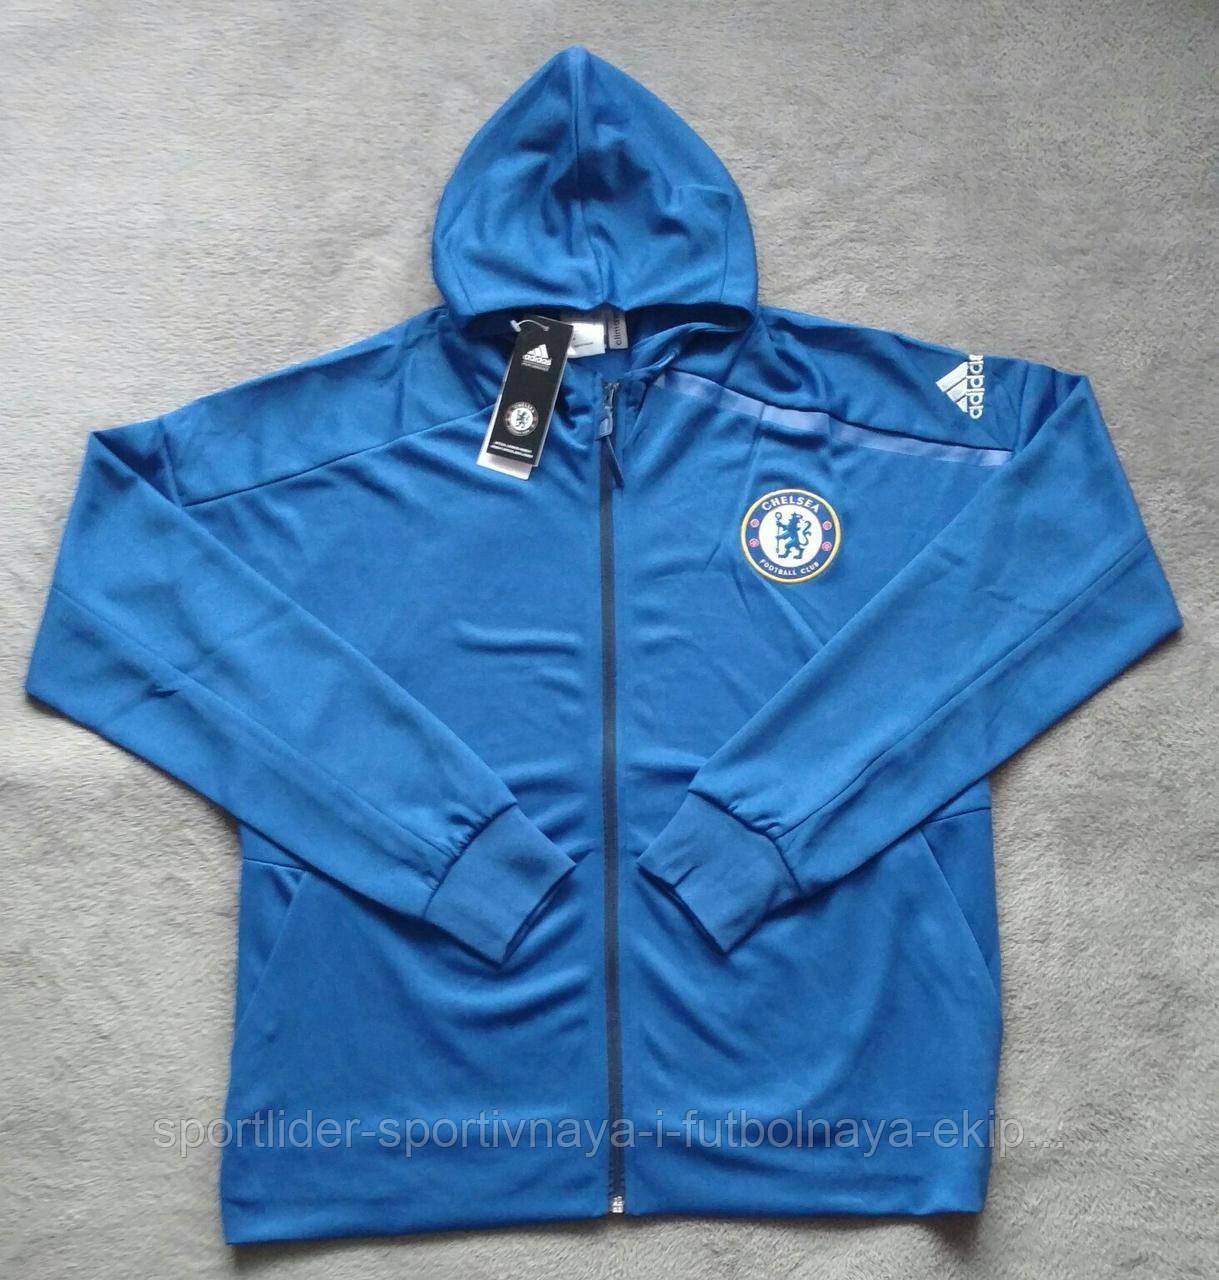 8ff3fc6ad4c80 Олимпийка мужская с капюшоном Adidas Hoodie Adidas Chelsea F.C. 2016-17 -  Спортлидер› спортивная